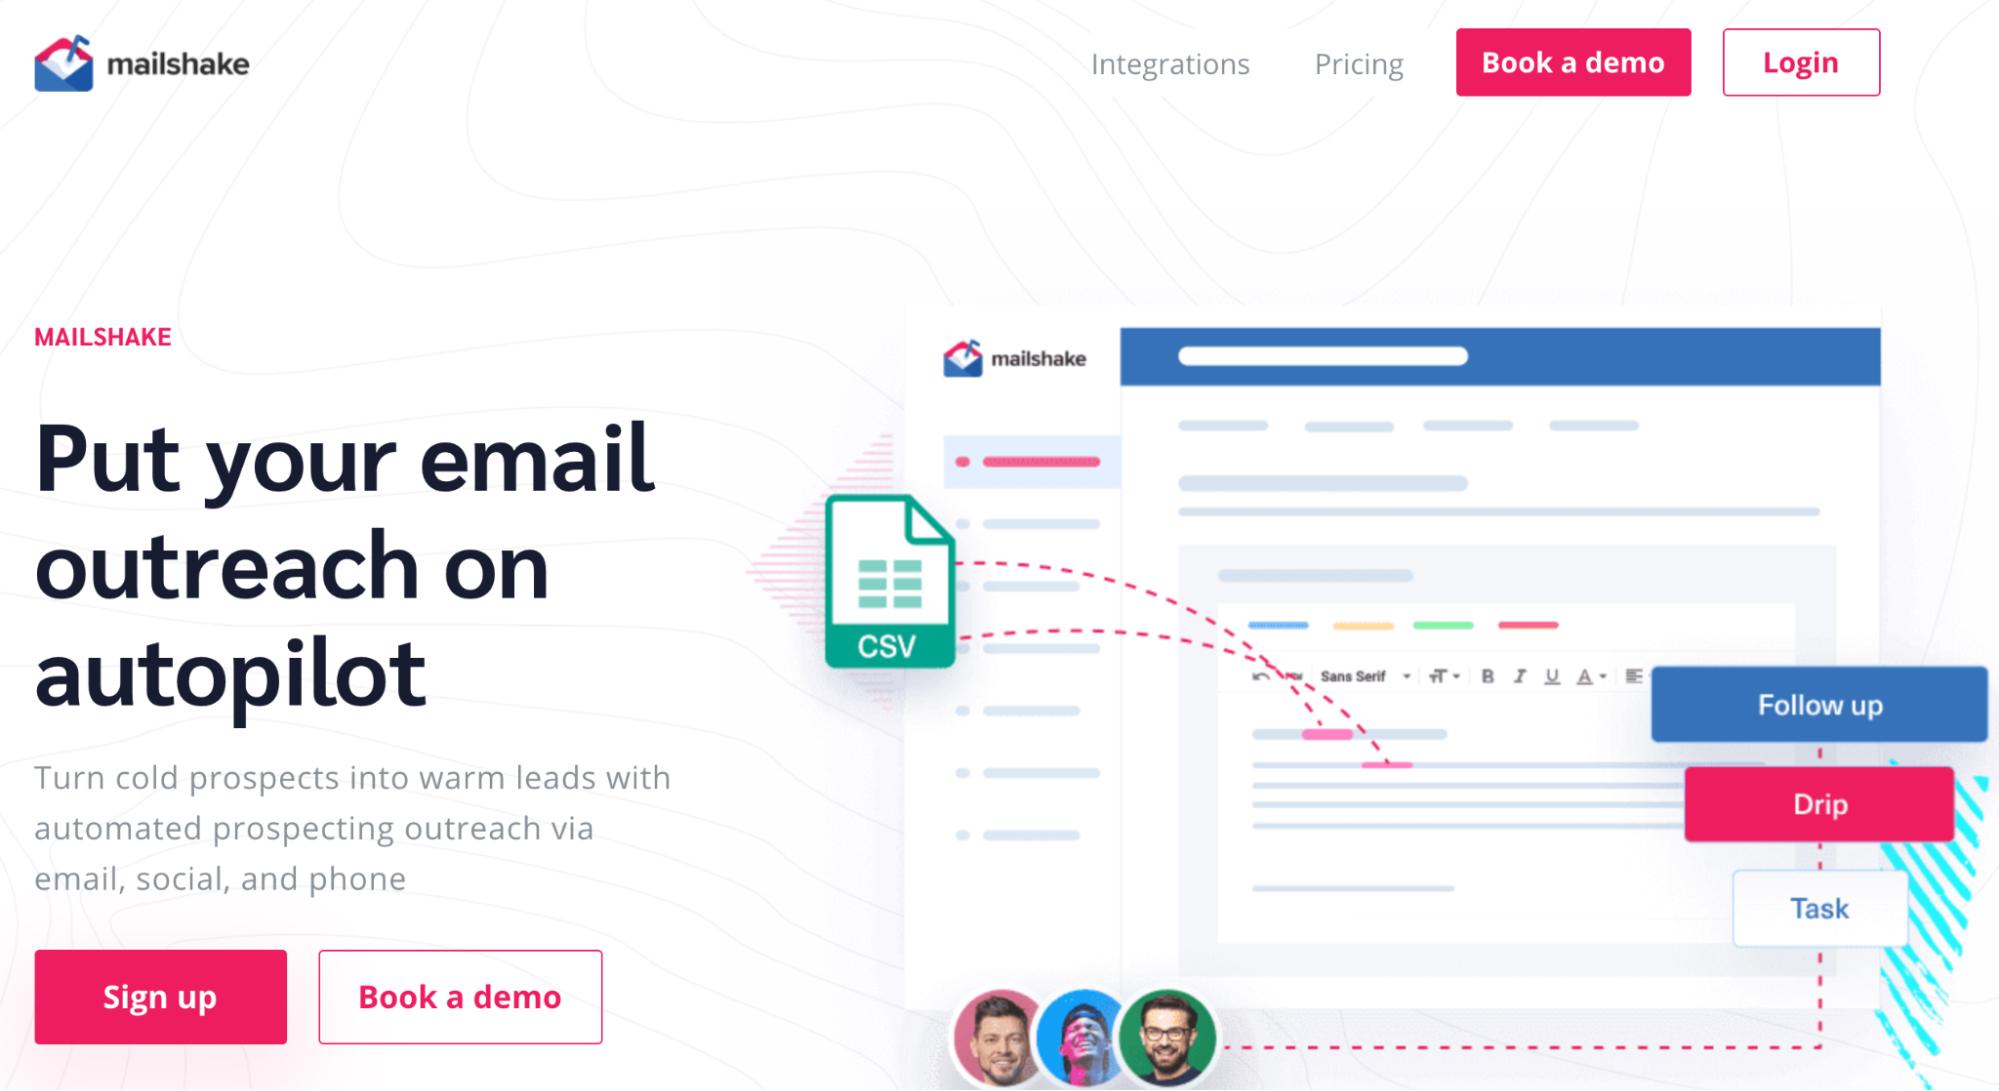 SaaS Marketing Automation Tools: Mailshake Screenshot